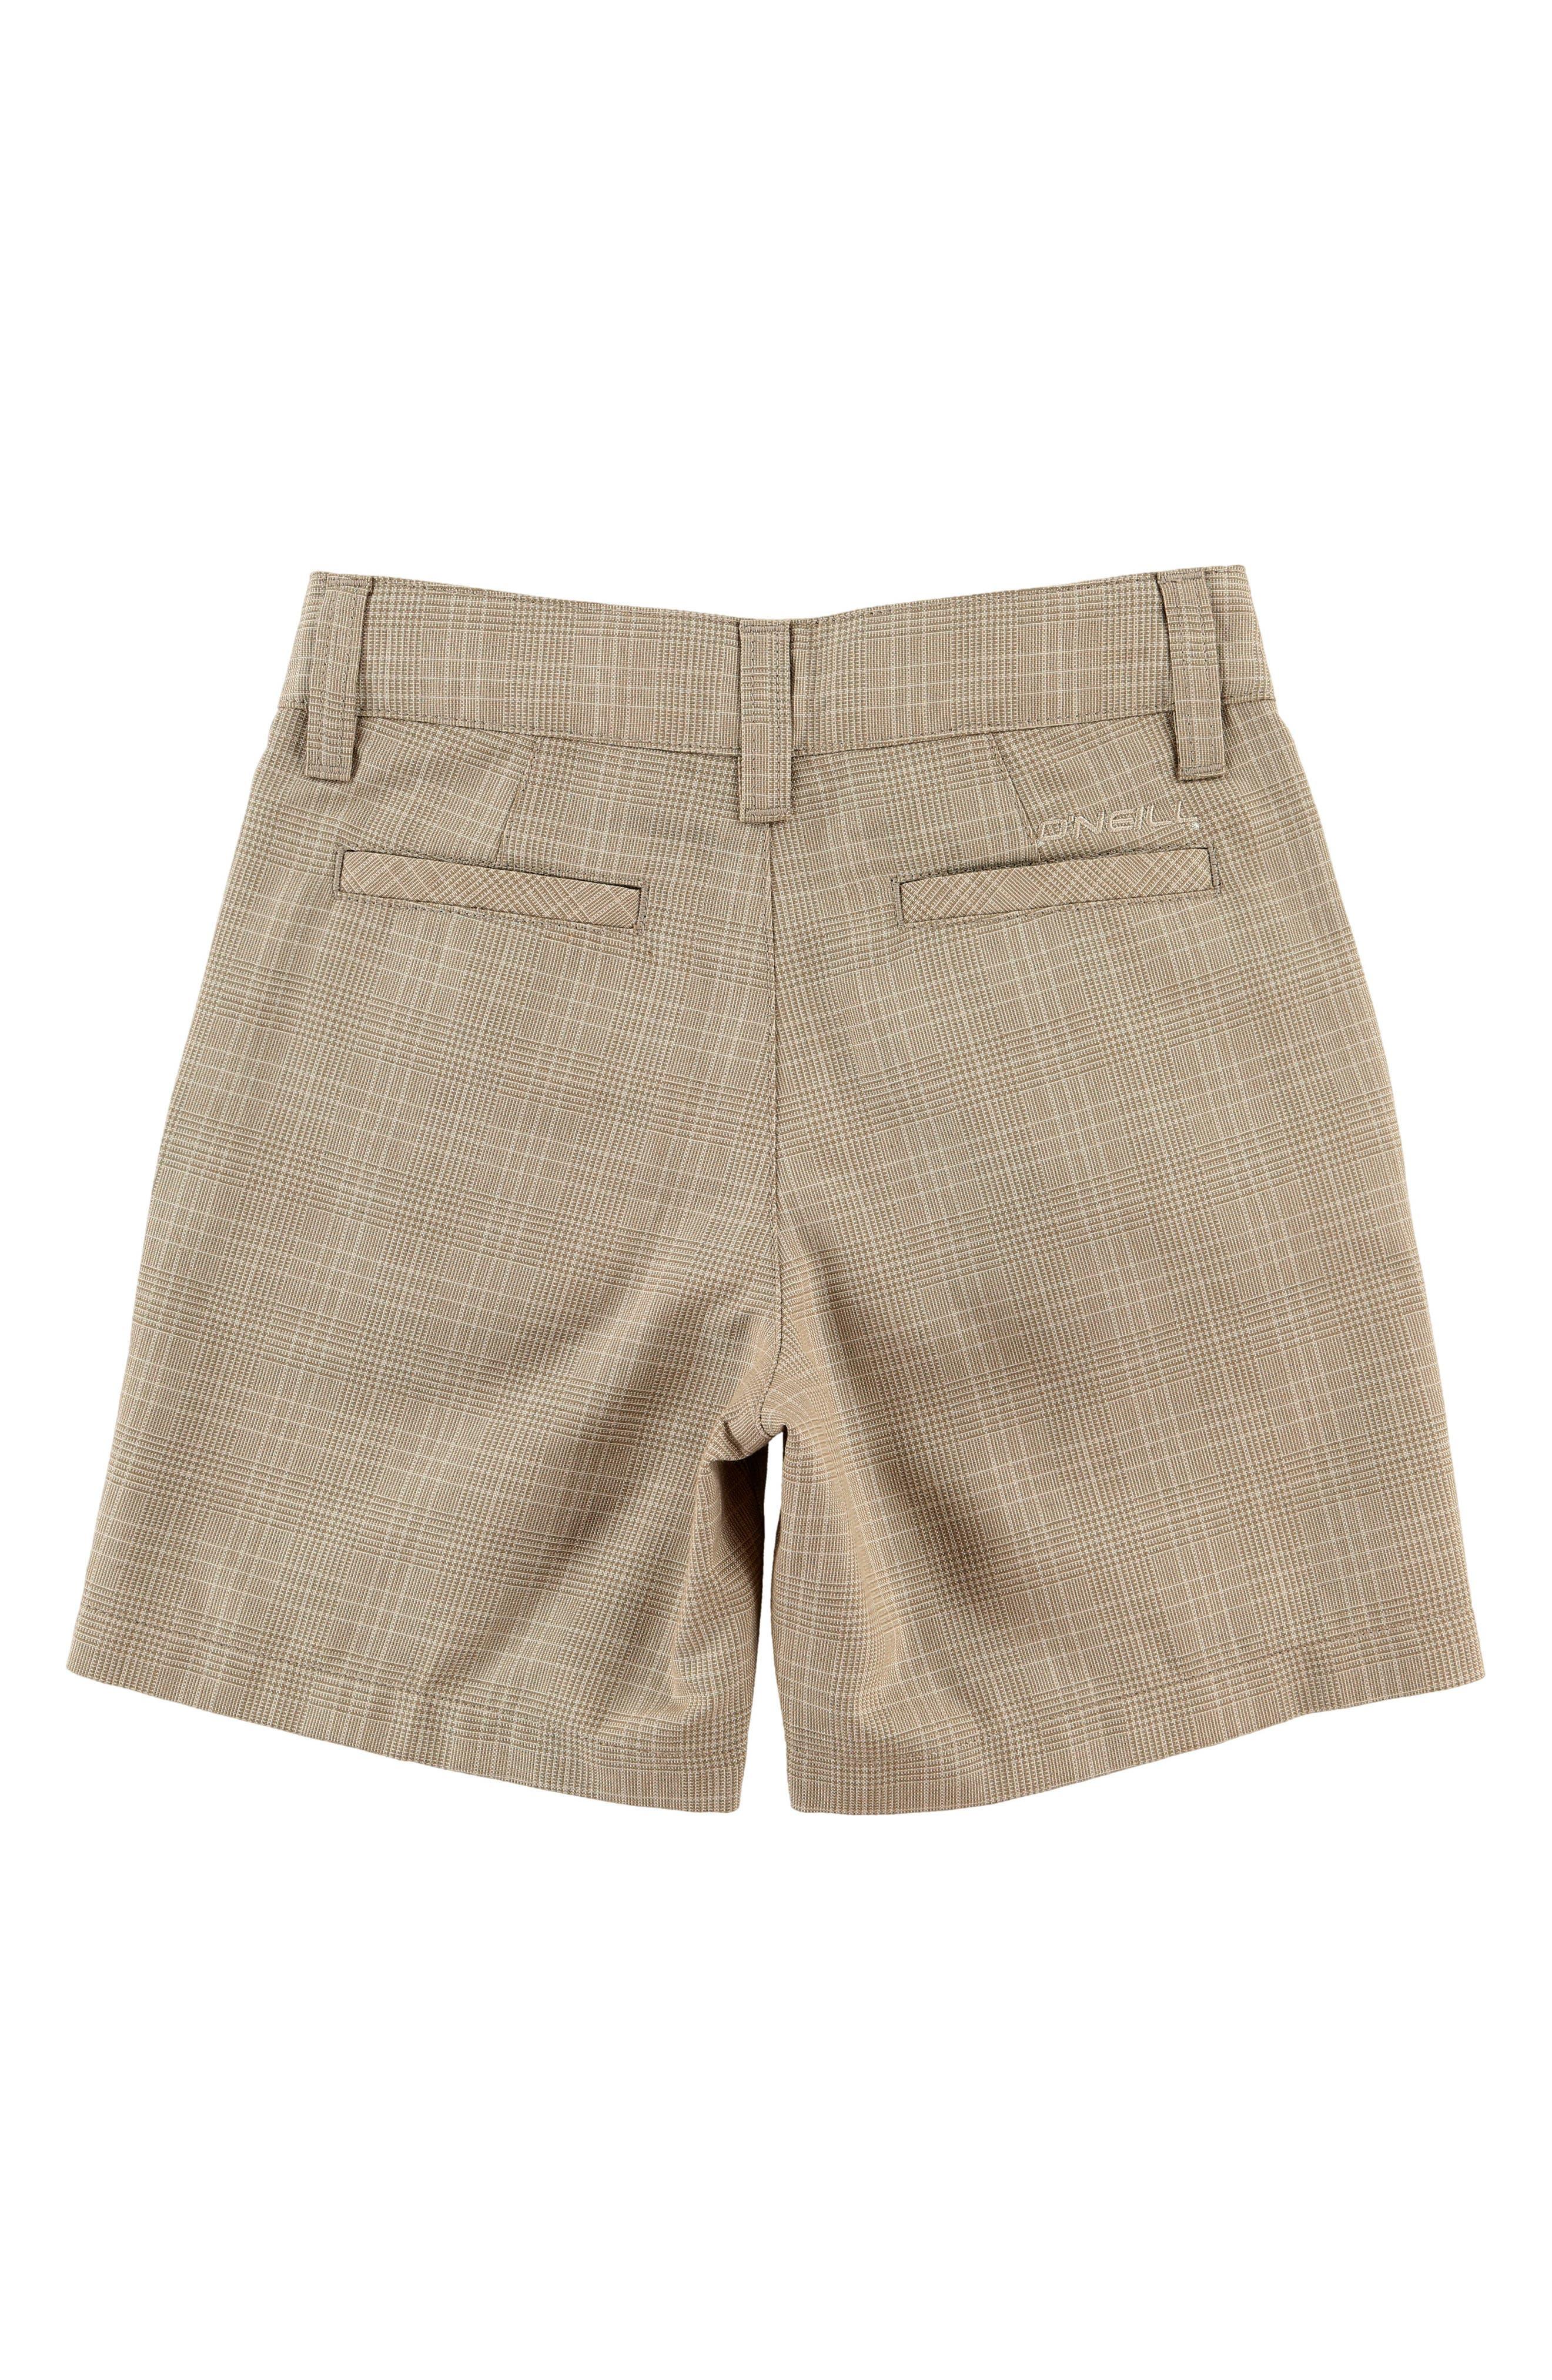 Delta Plaid Shorts,                             Alternate thumbnail 2, color,                             Dark Stone